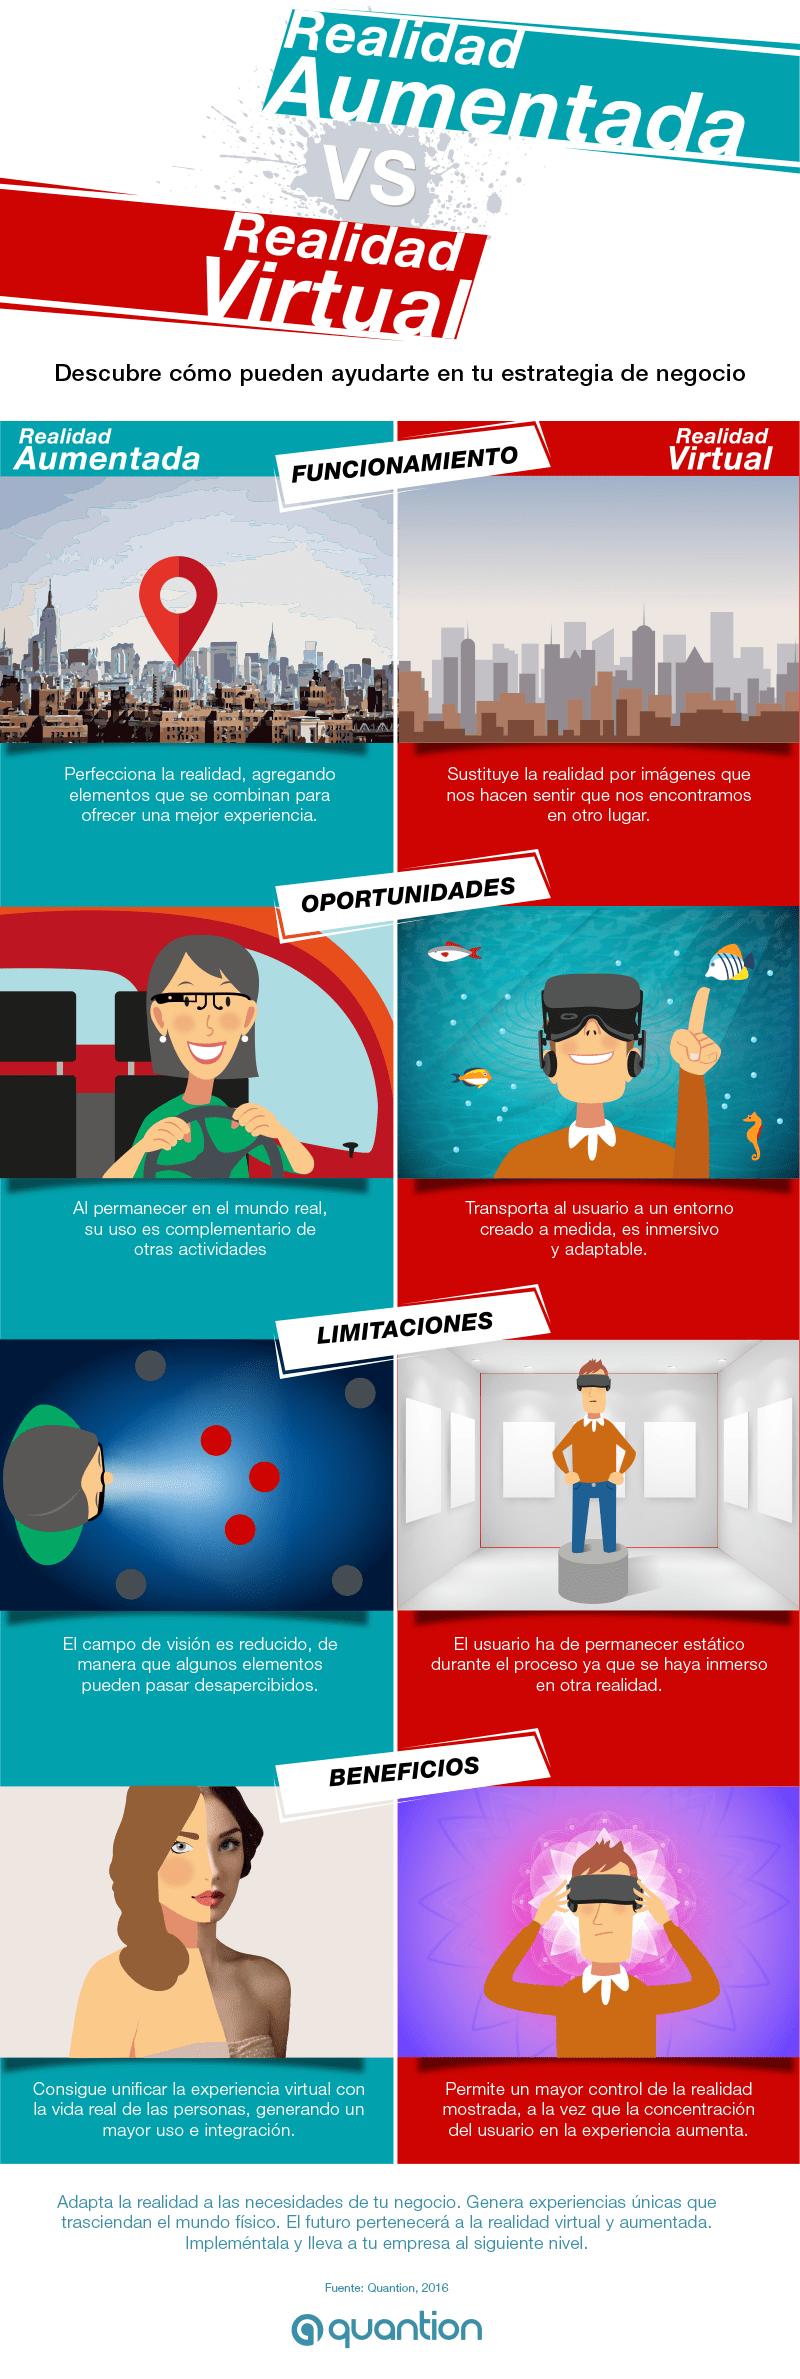 realidad-aumentada-vs-realidad-virtual-infografia